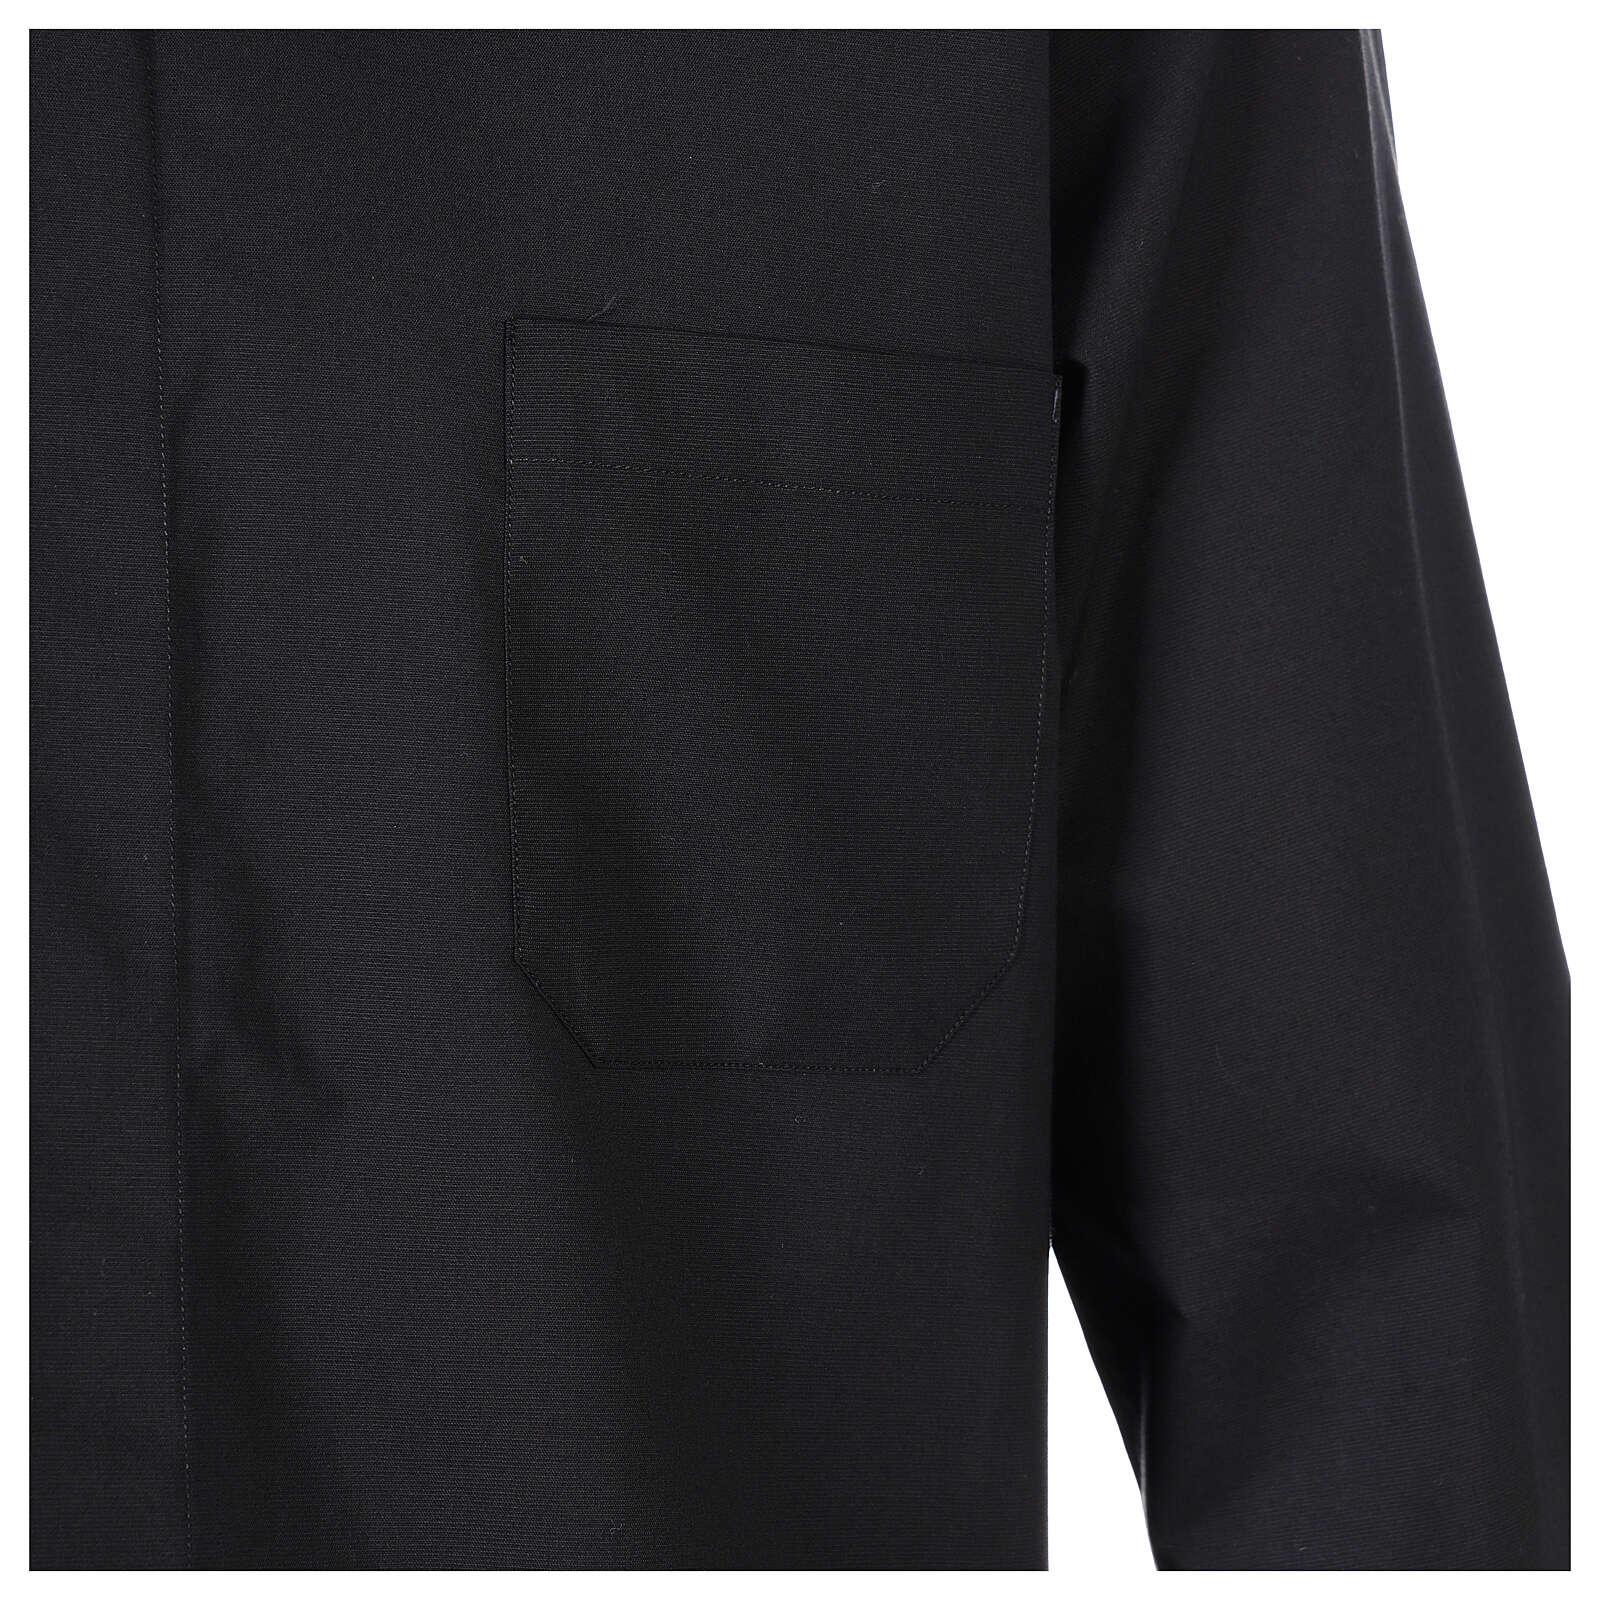 Camisa cuello clergy negro Manga Larga 4